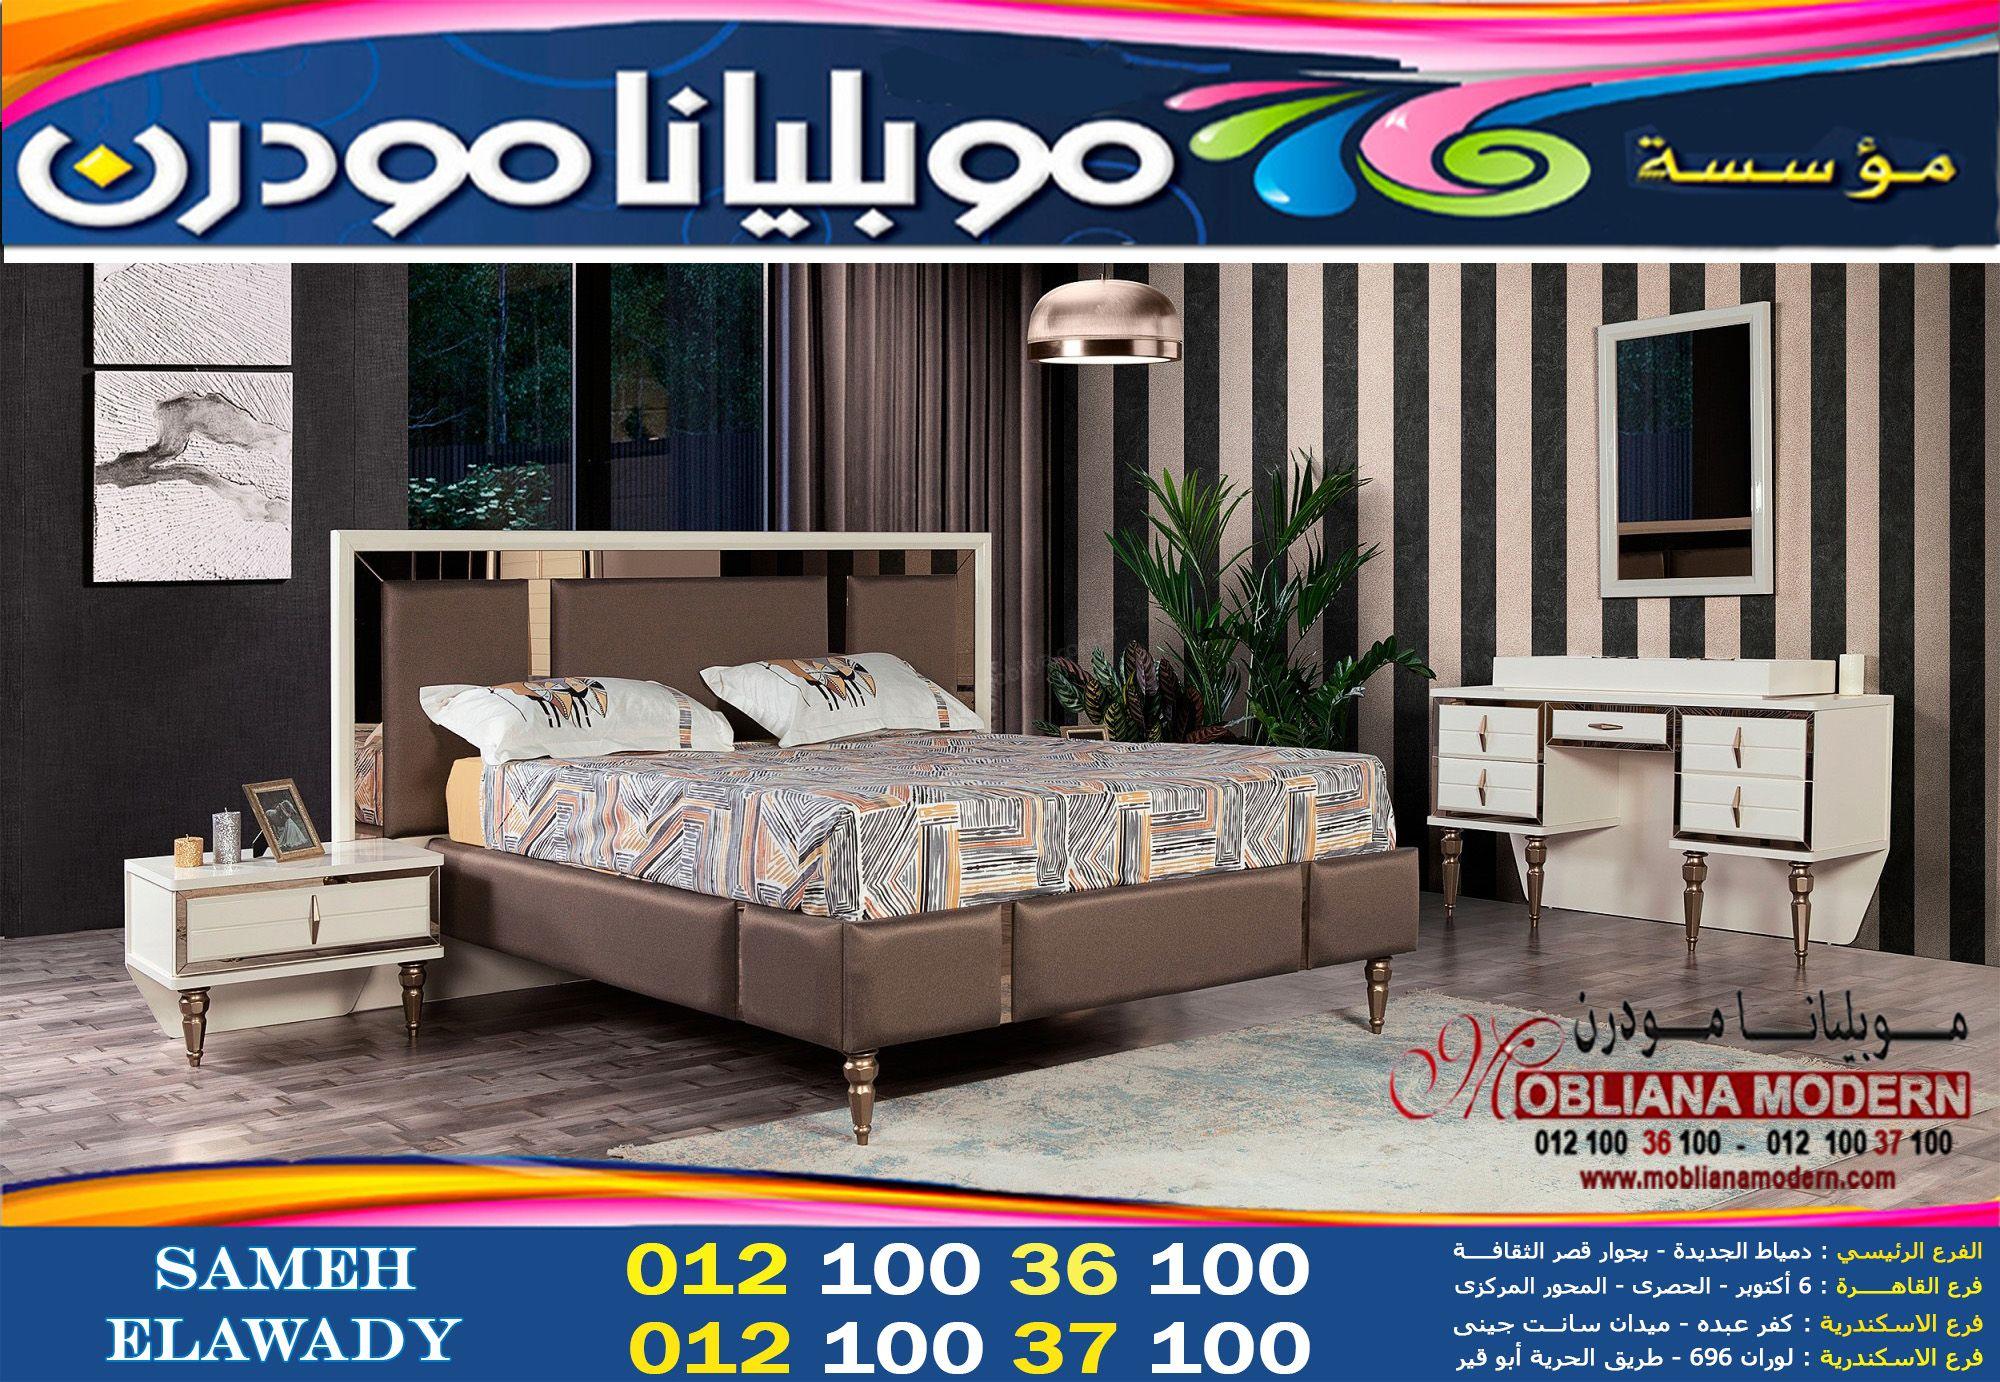 غرف نوم استنلس غرف نوم شامبين غرف نوم عصرية Home Decor Bedroom Furniture